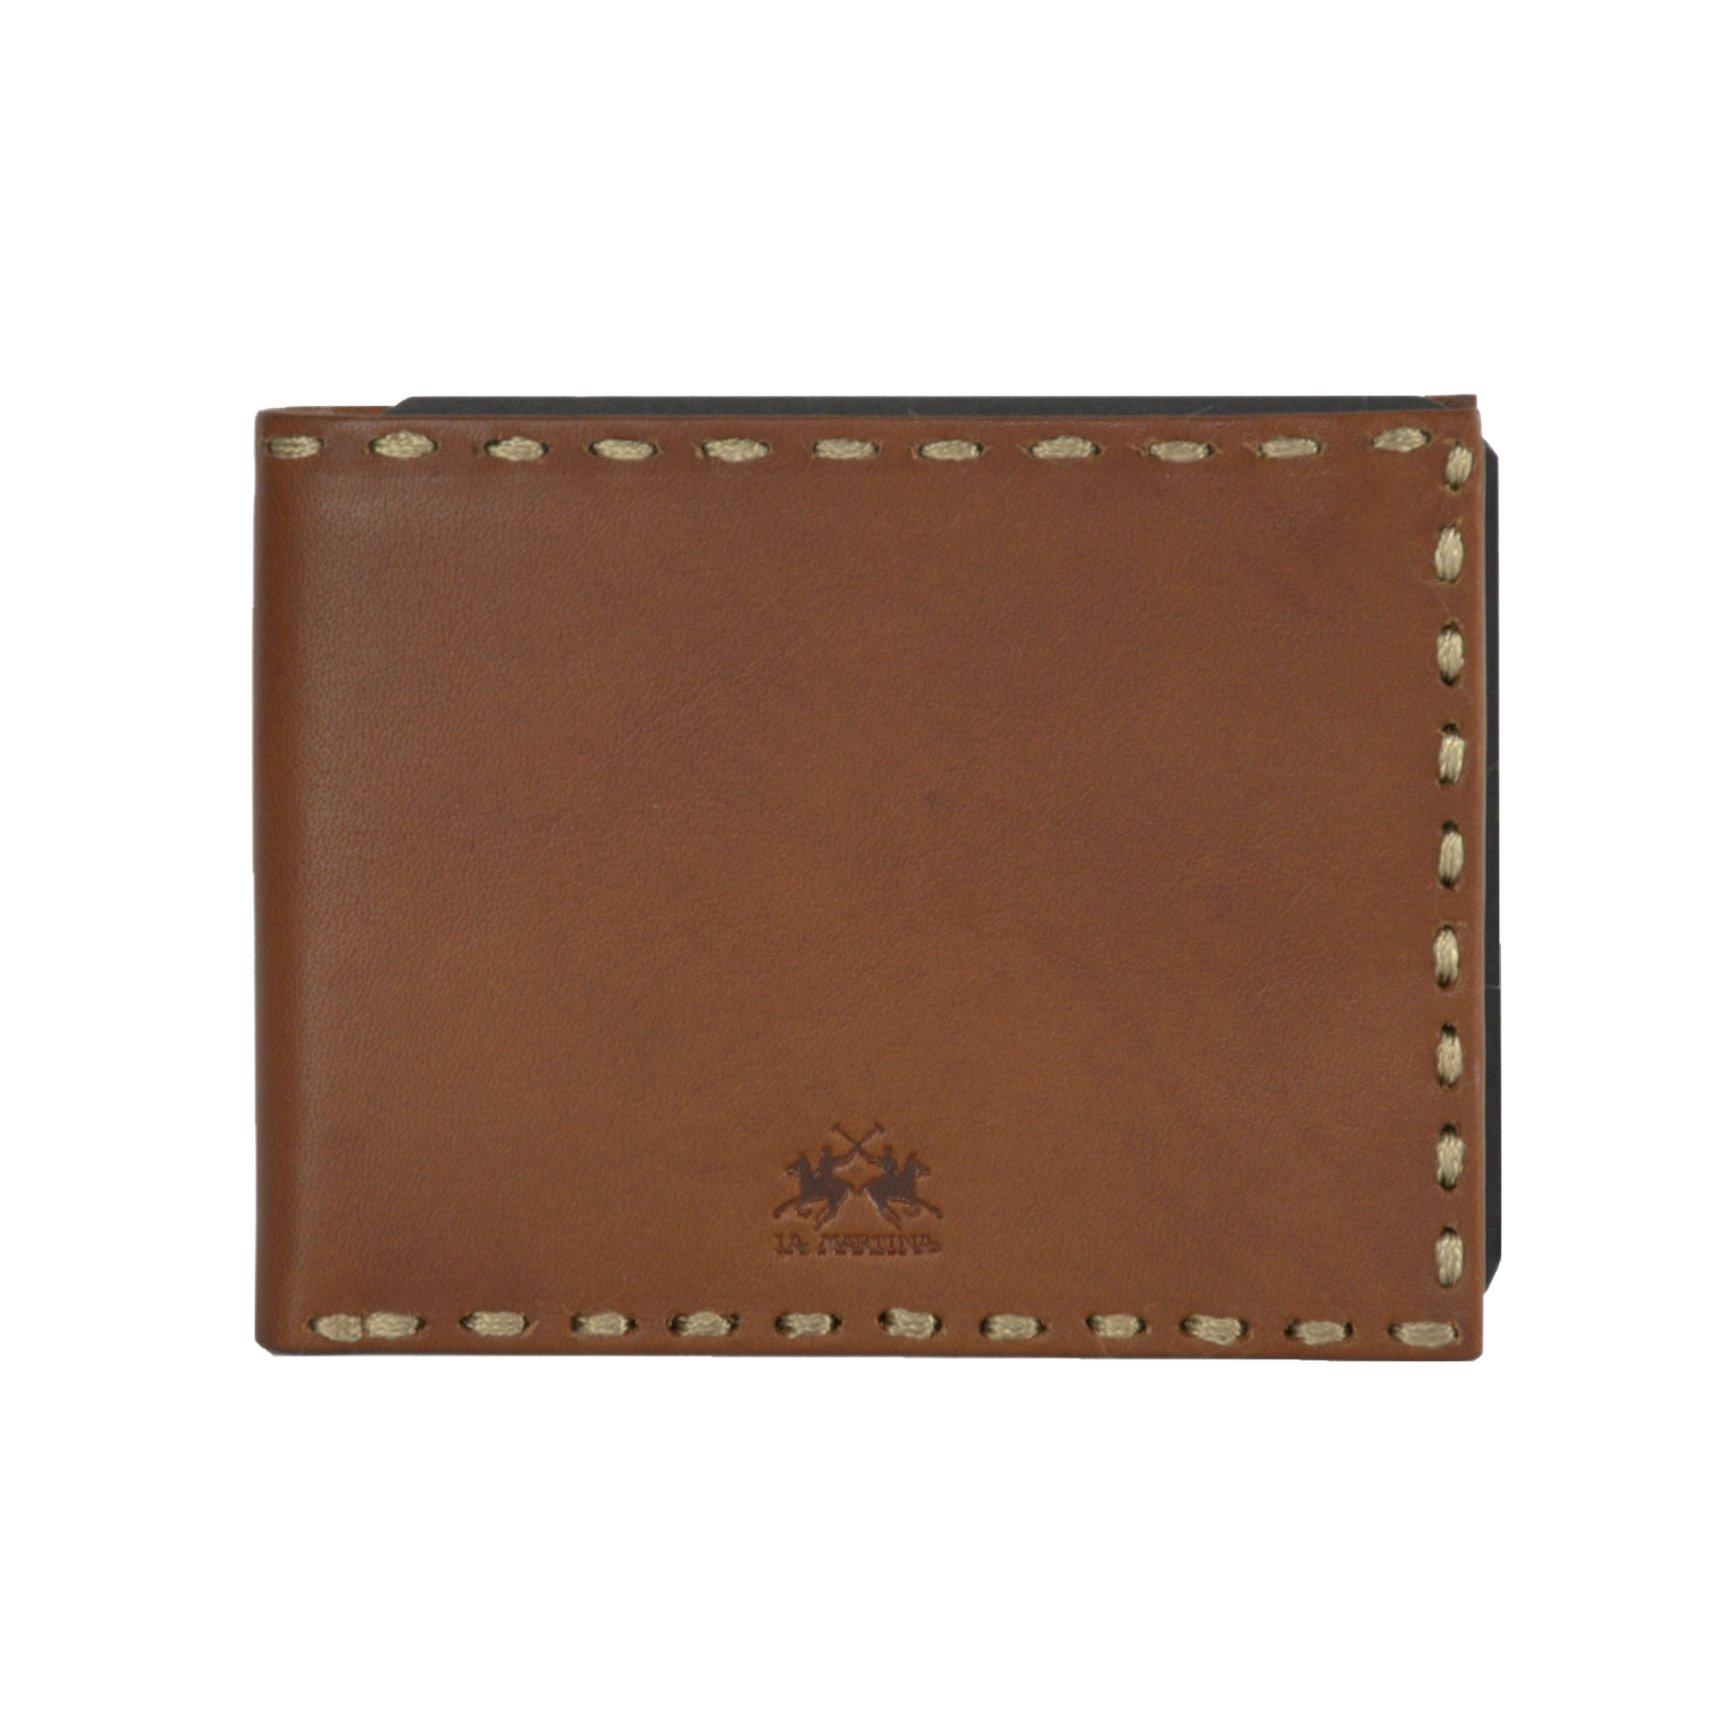 La Martina Men's Wallet Cognac LA1432641